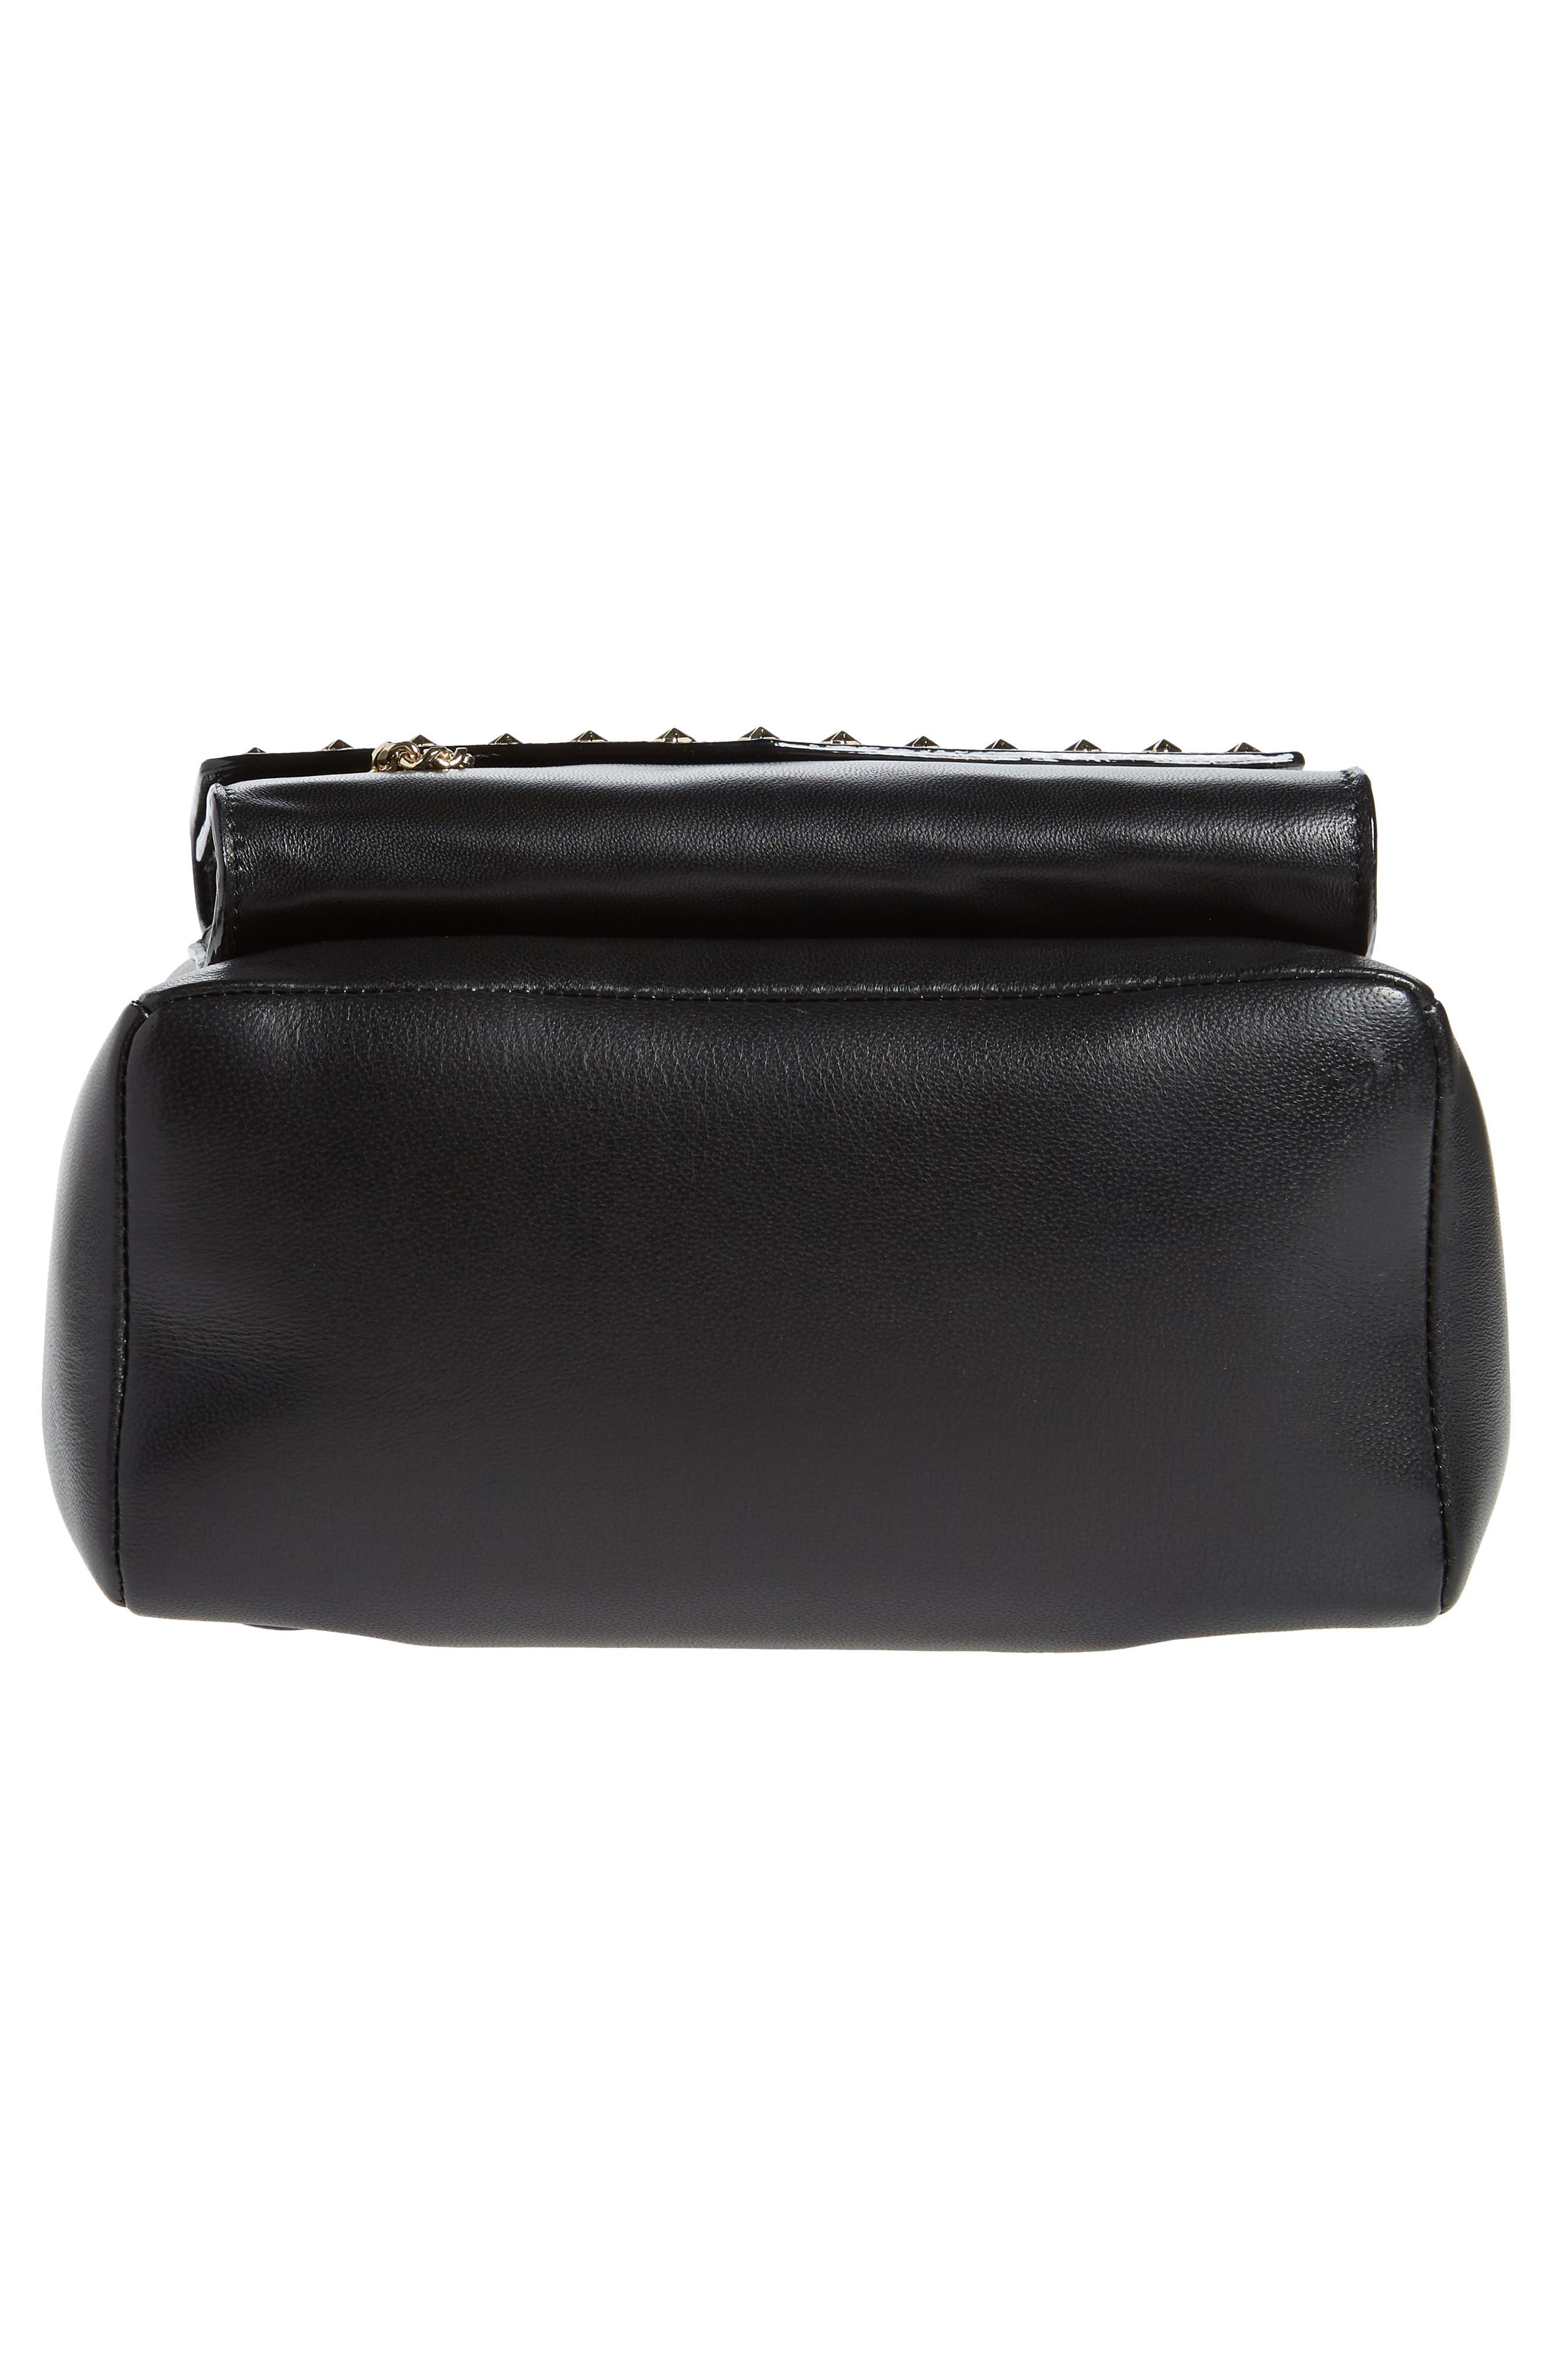 Cassie Star Studded Lambskin Leather Backpack,                             Alternate thumbnail 6, color,                             Black